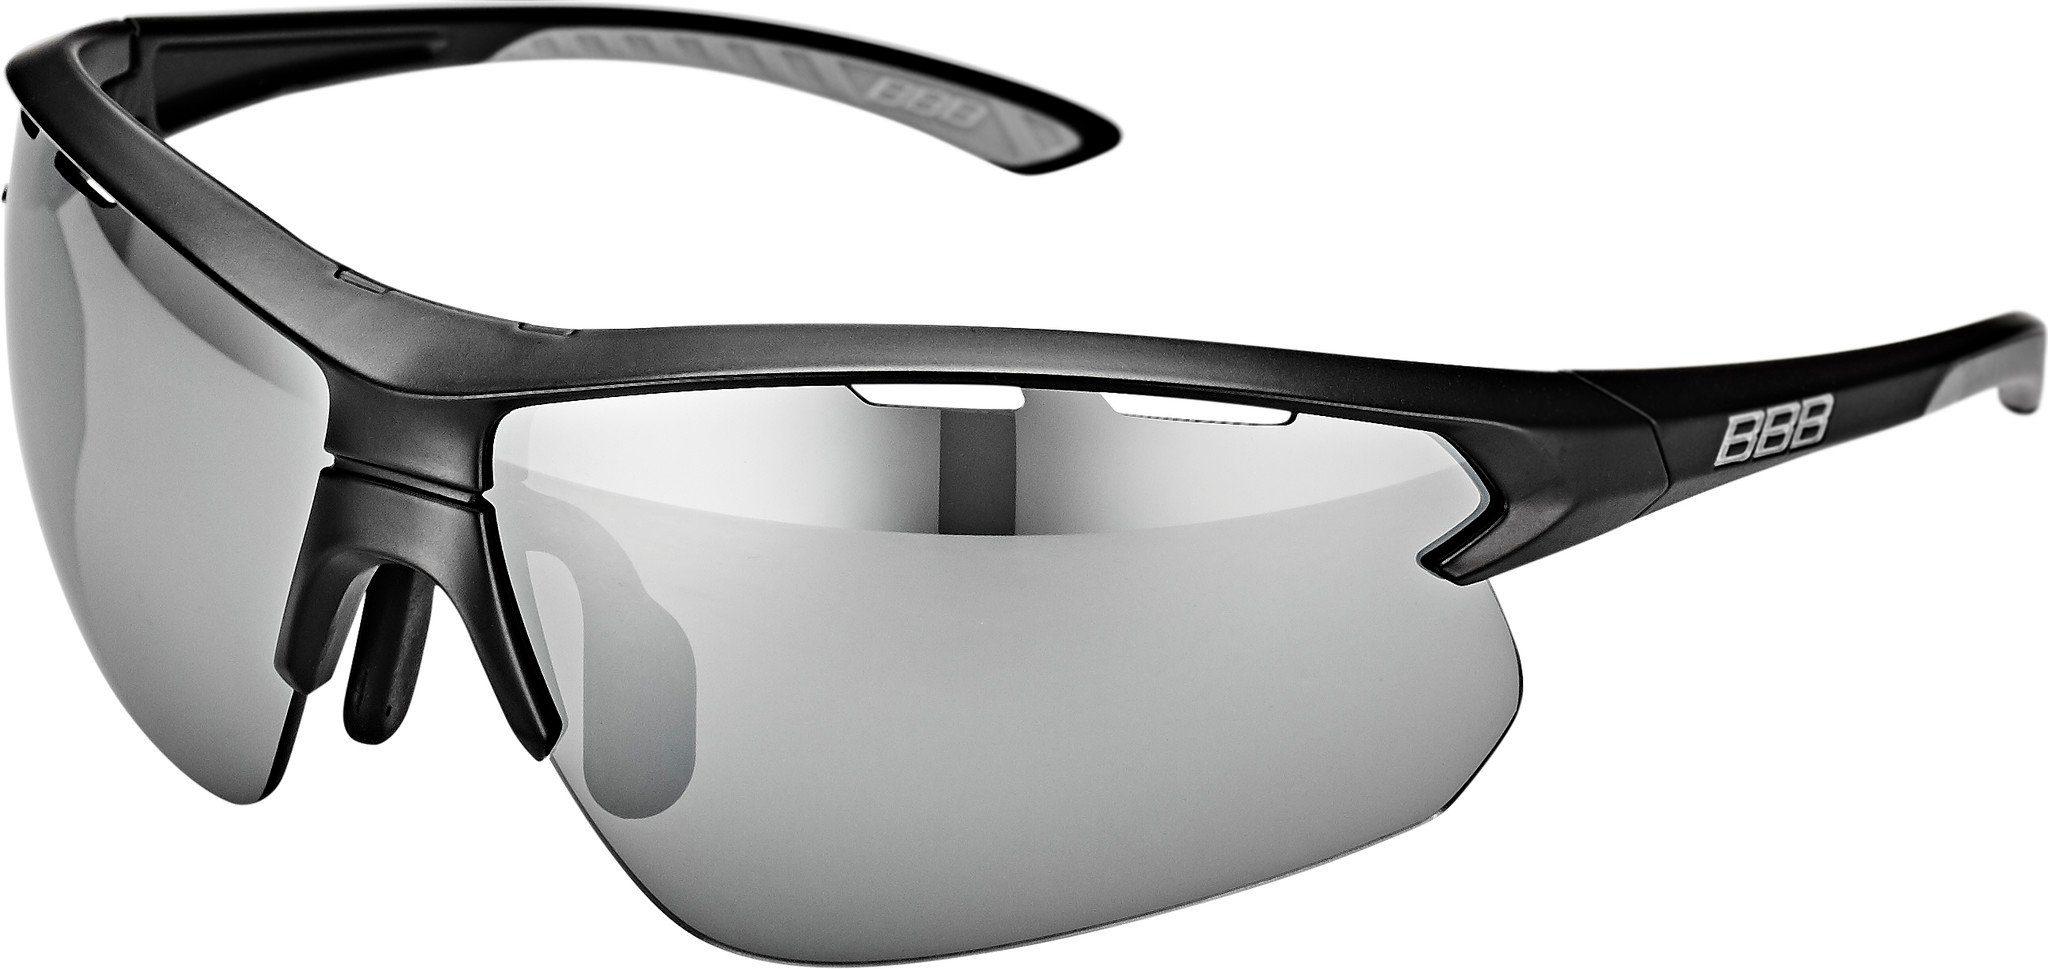 BBB Radsportbrille »Impulse BSG-52 Sportbrille«